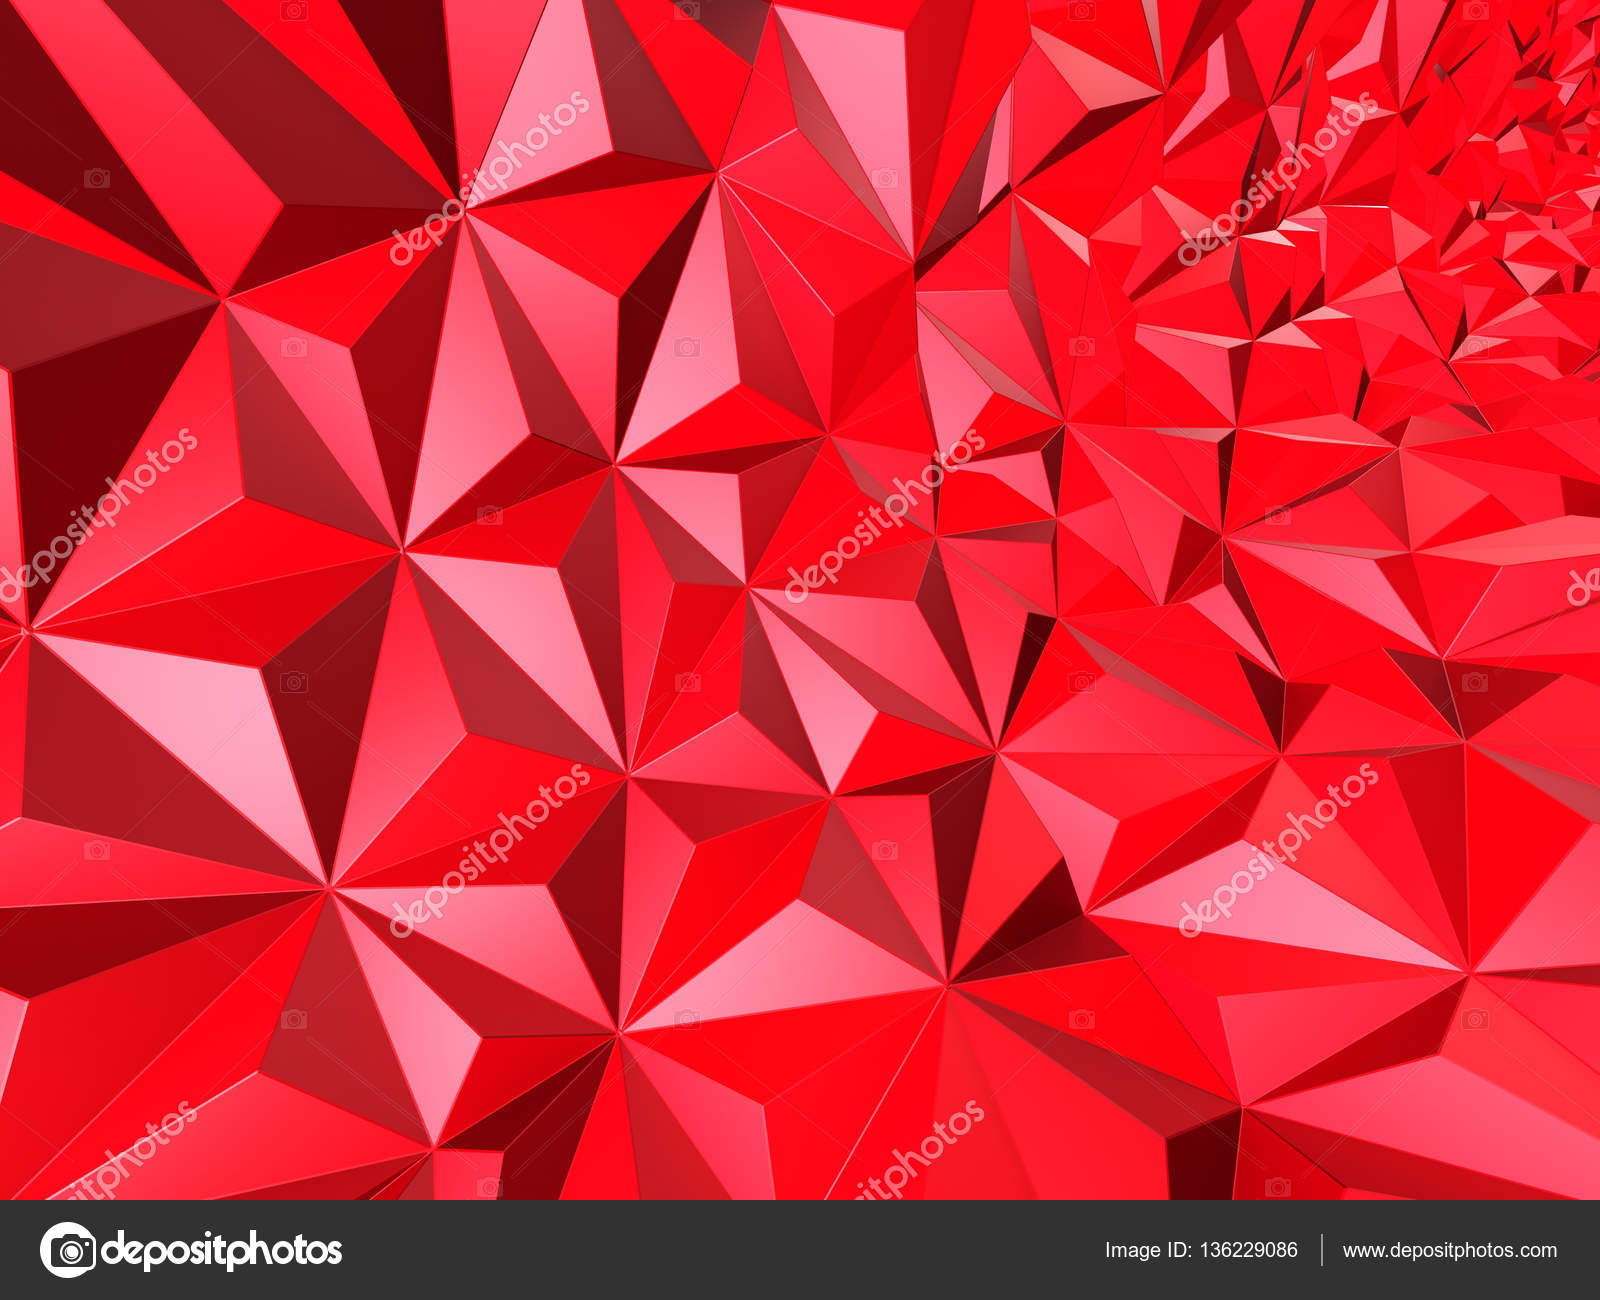 Fondo Geométrico: Fondo Geométrico Abstracto Rojo